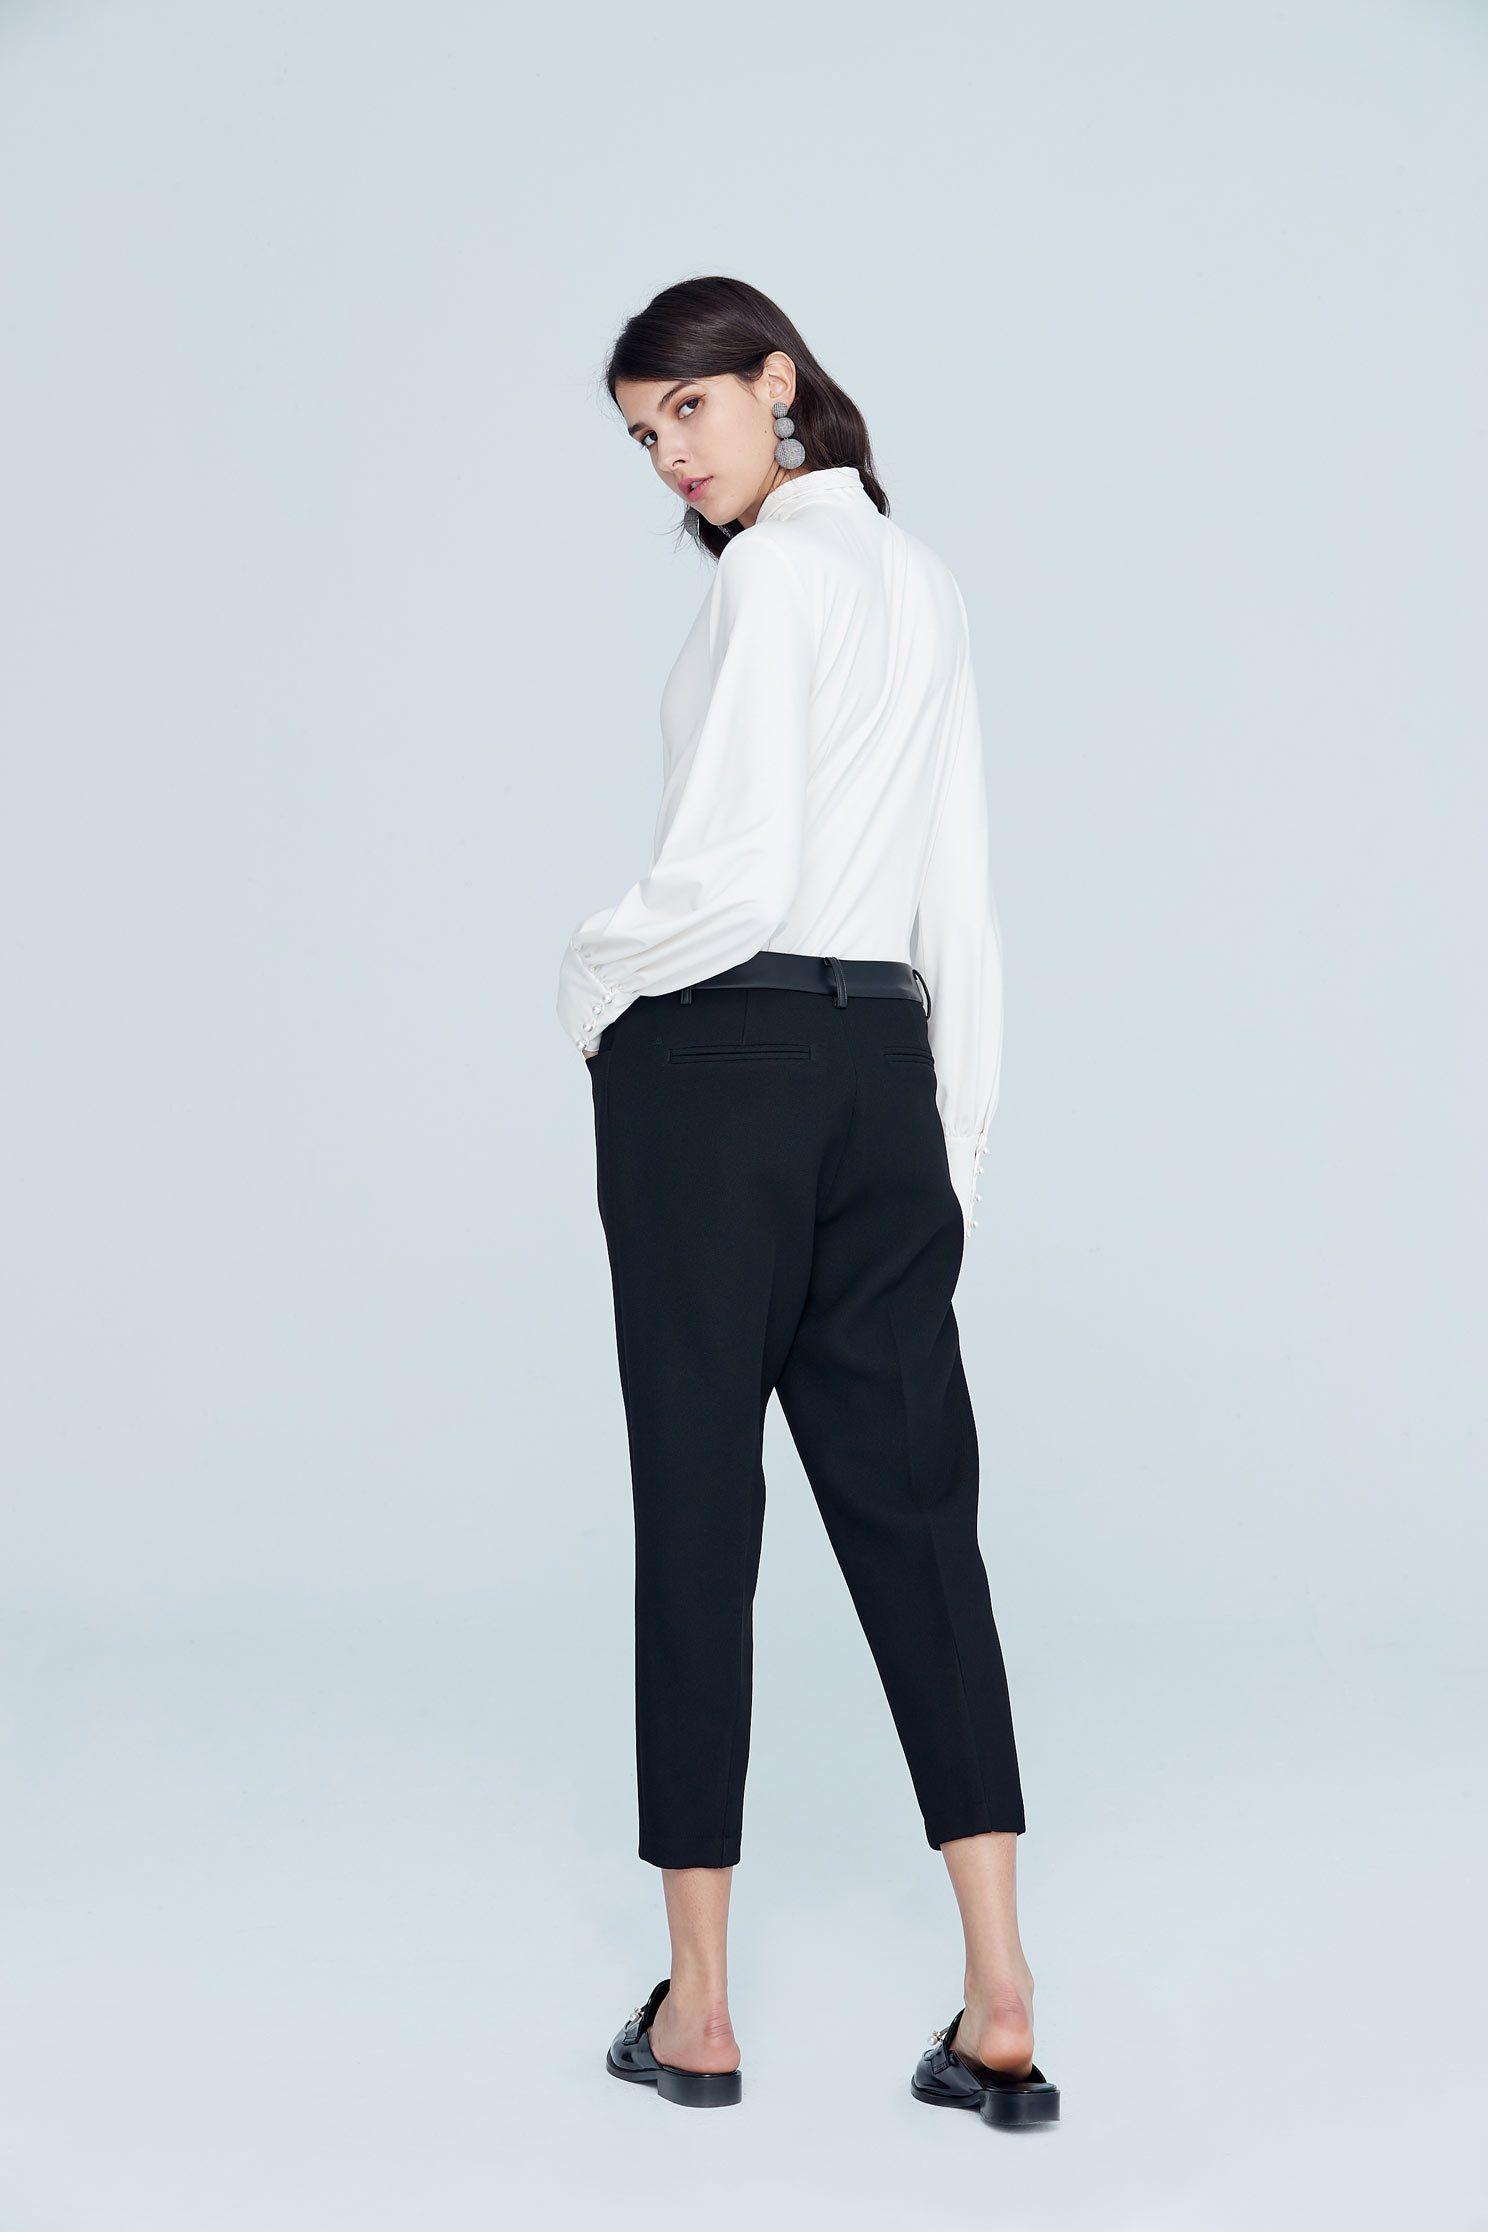 Elegant temperament classic top,top,whitetop,cotton,blouse,longsleevetop